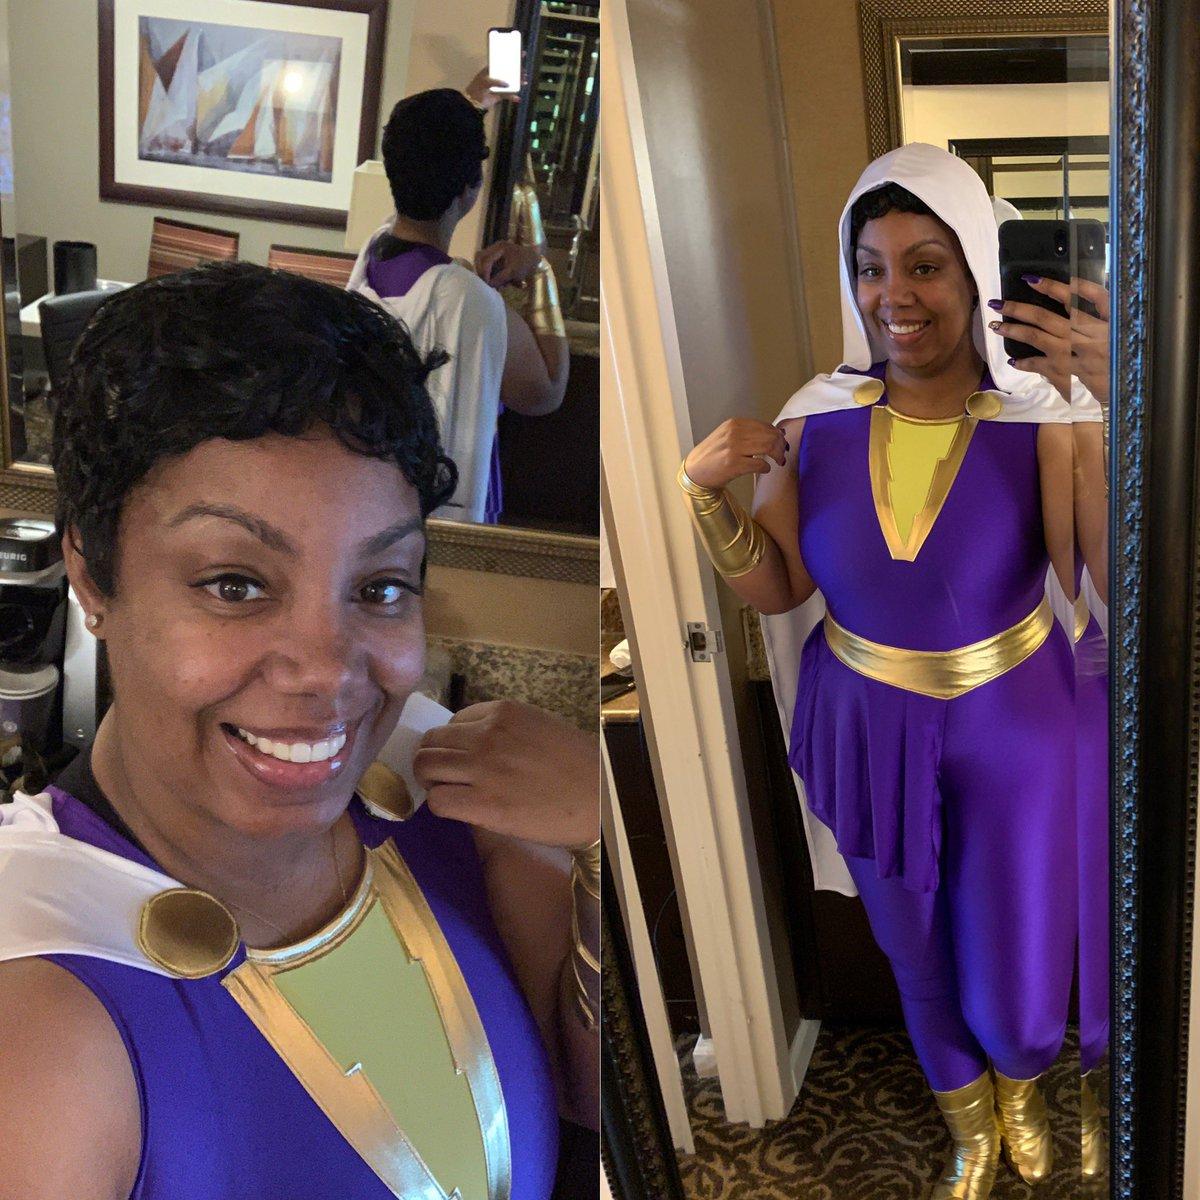 SHAZAM!!! Comic-Con day 1 Darla Dudley #Shazam #ShazamFamily  . . . #SSCC2019 #SSCC19 #SDCC50 #SDCC #BlackCosplayer #BlackWomenInCostume #CosplayerGirl #BlackCosplay #Blerd #BlackGirlMagic #BlackNerd #BlackWomenSmile #BlackCosplayersRock